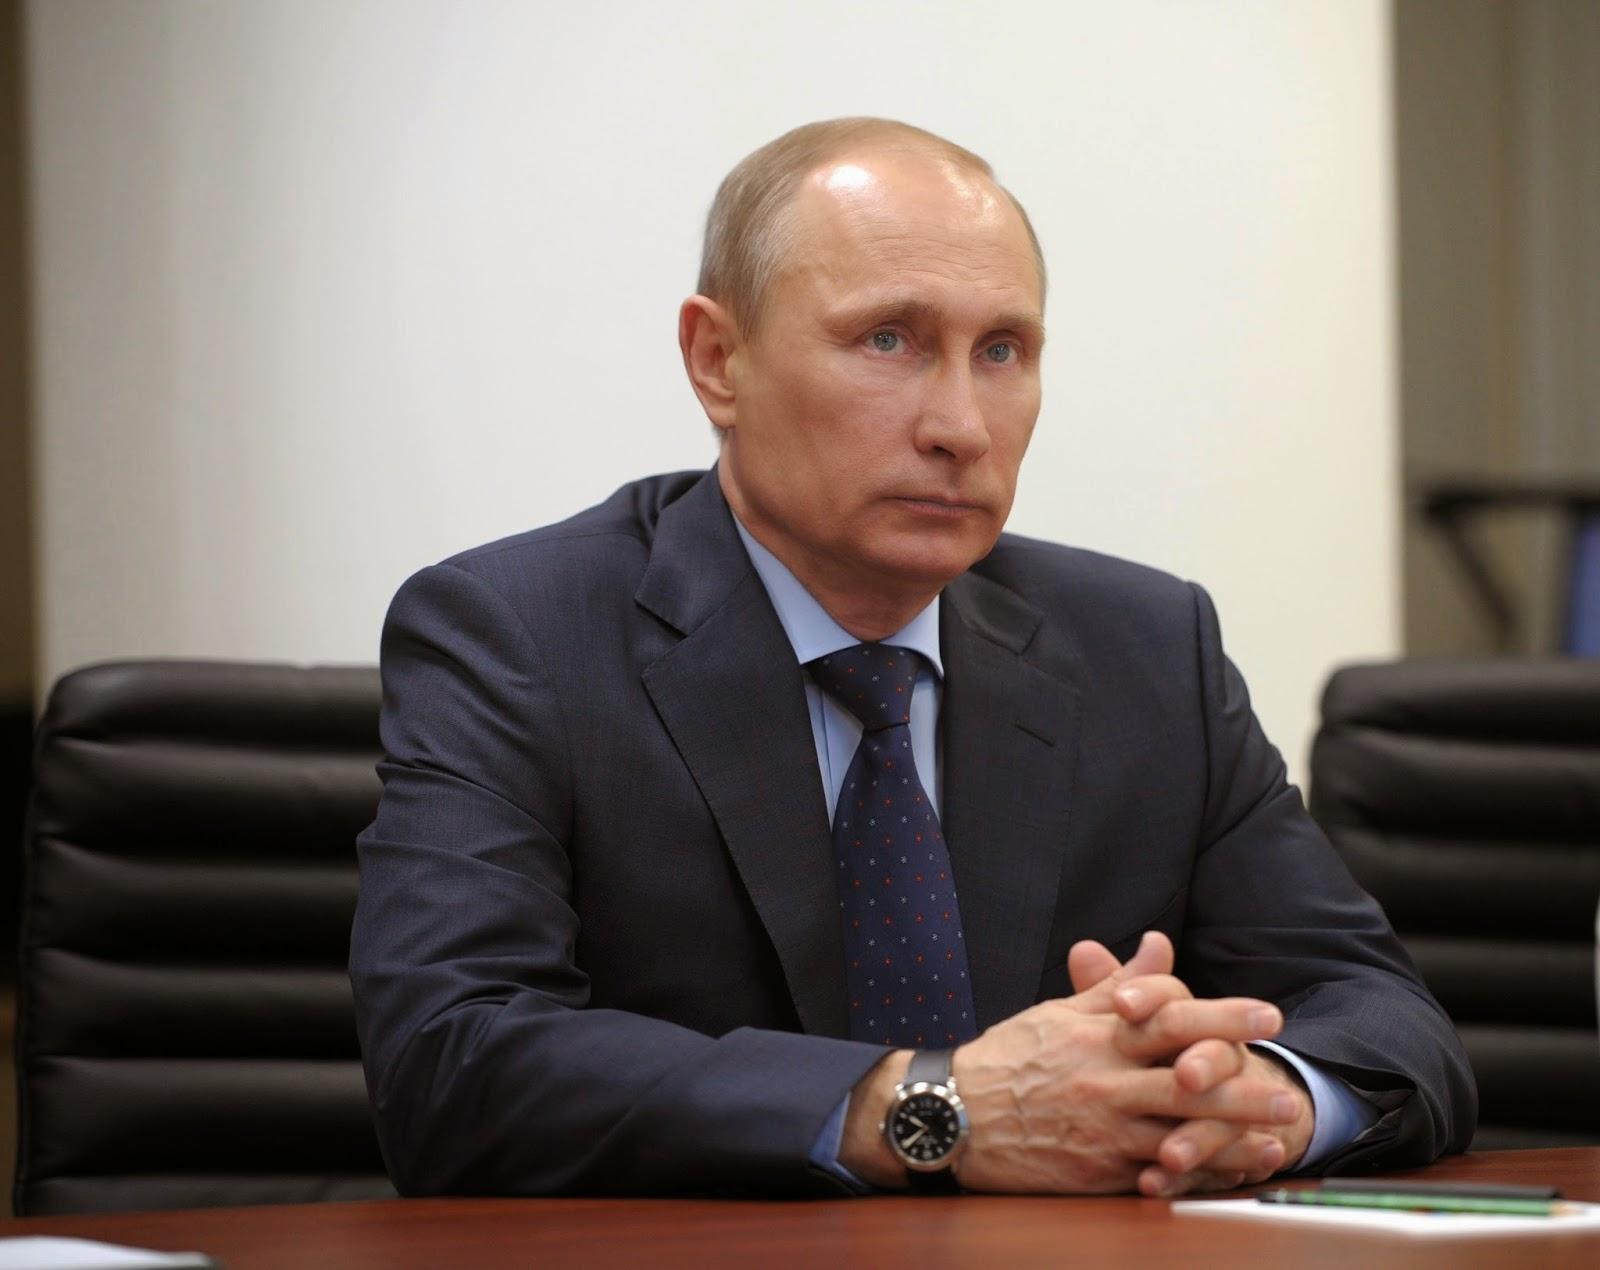 Vladimir Putin, Russia, G20, Angela Merkel, Alemanha, David Cameron, Reino Unido, sancoes economicas, Ucania